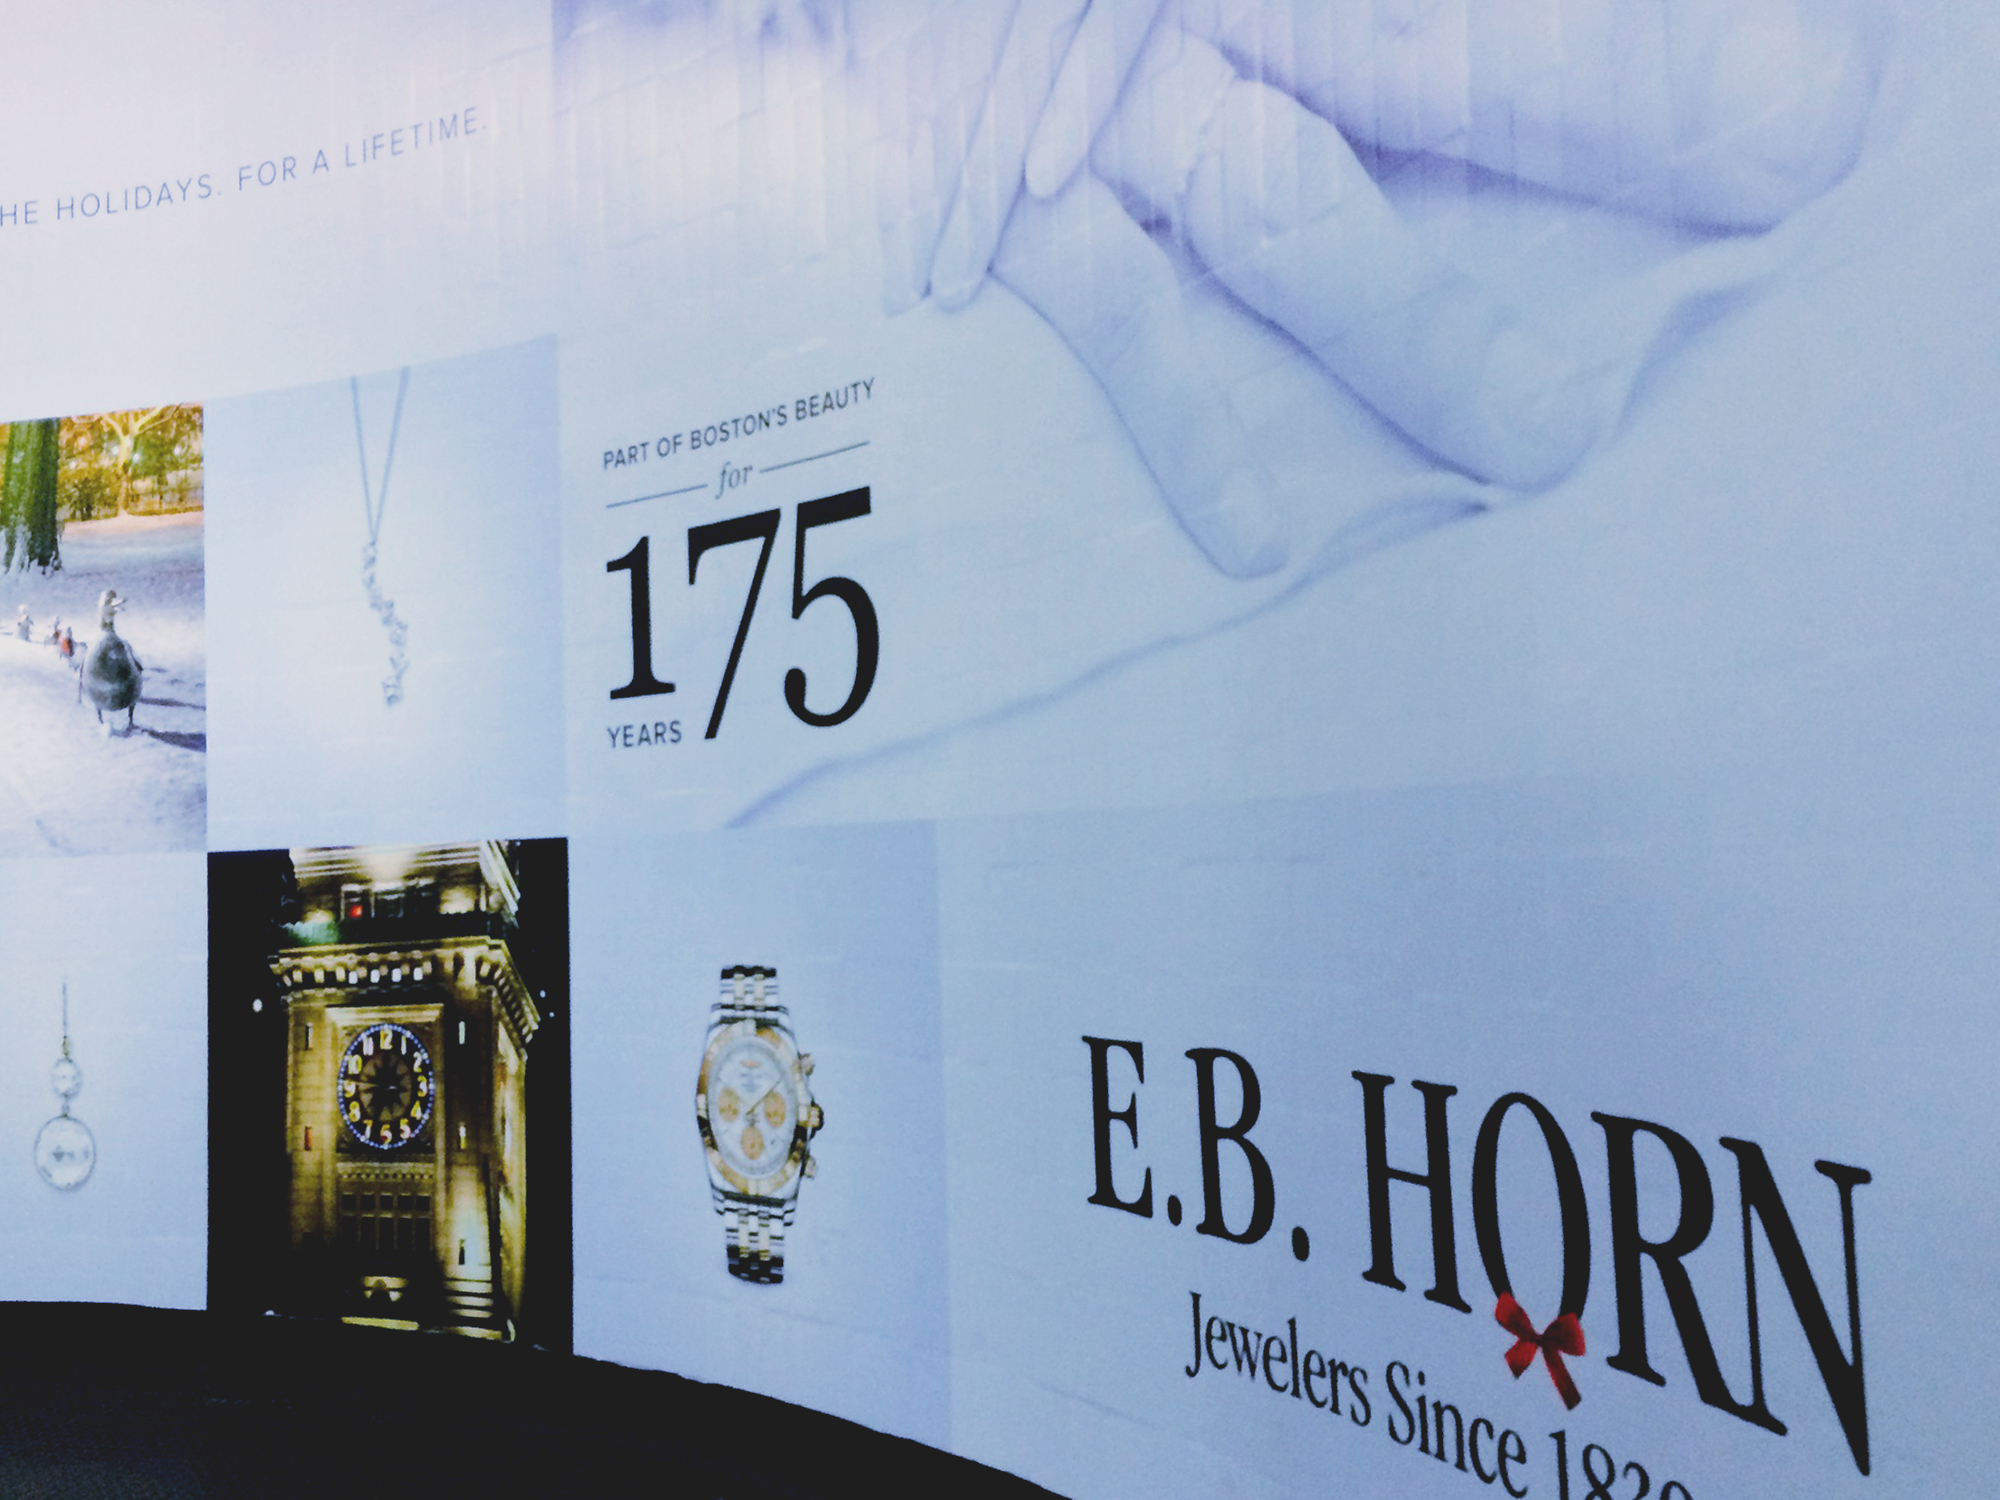 EBH14-Wall-image_02.jpg